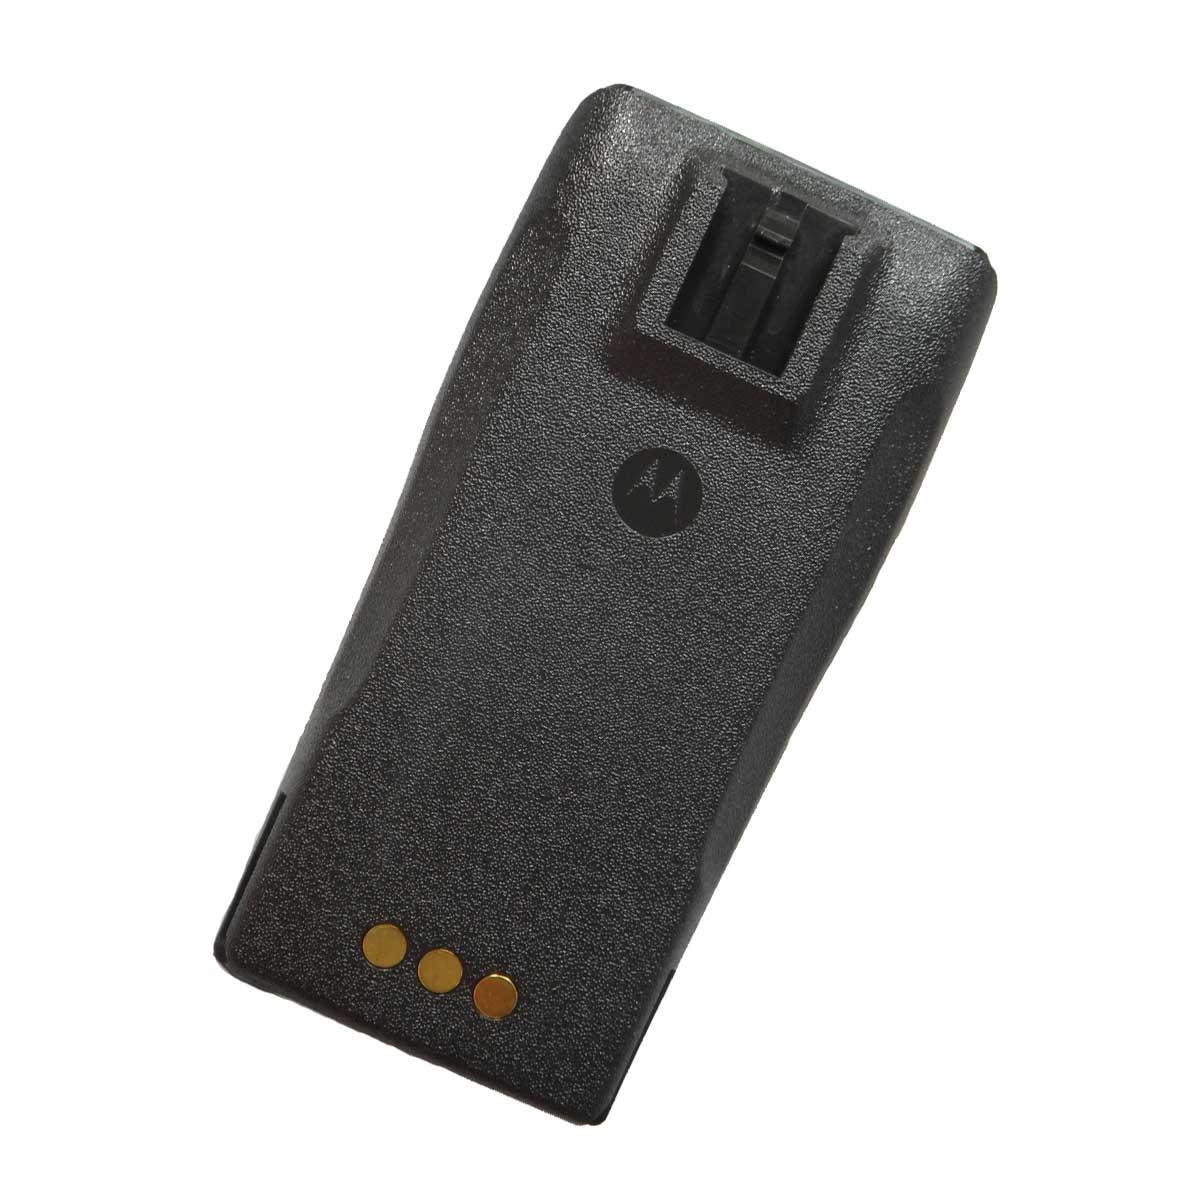 Batería Motorola Li-Ion 1700 mAh para radio DEP450 NNTN4970A